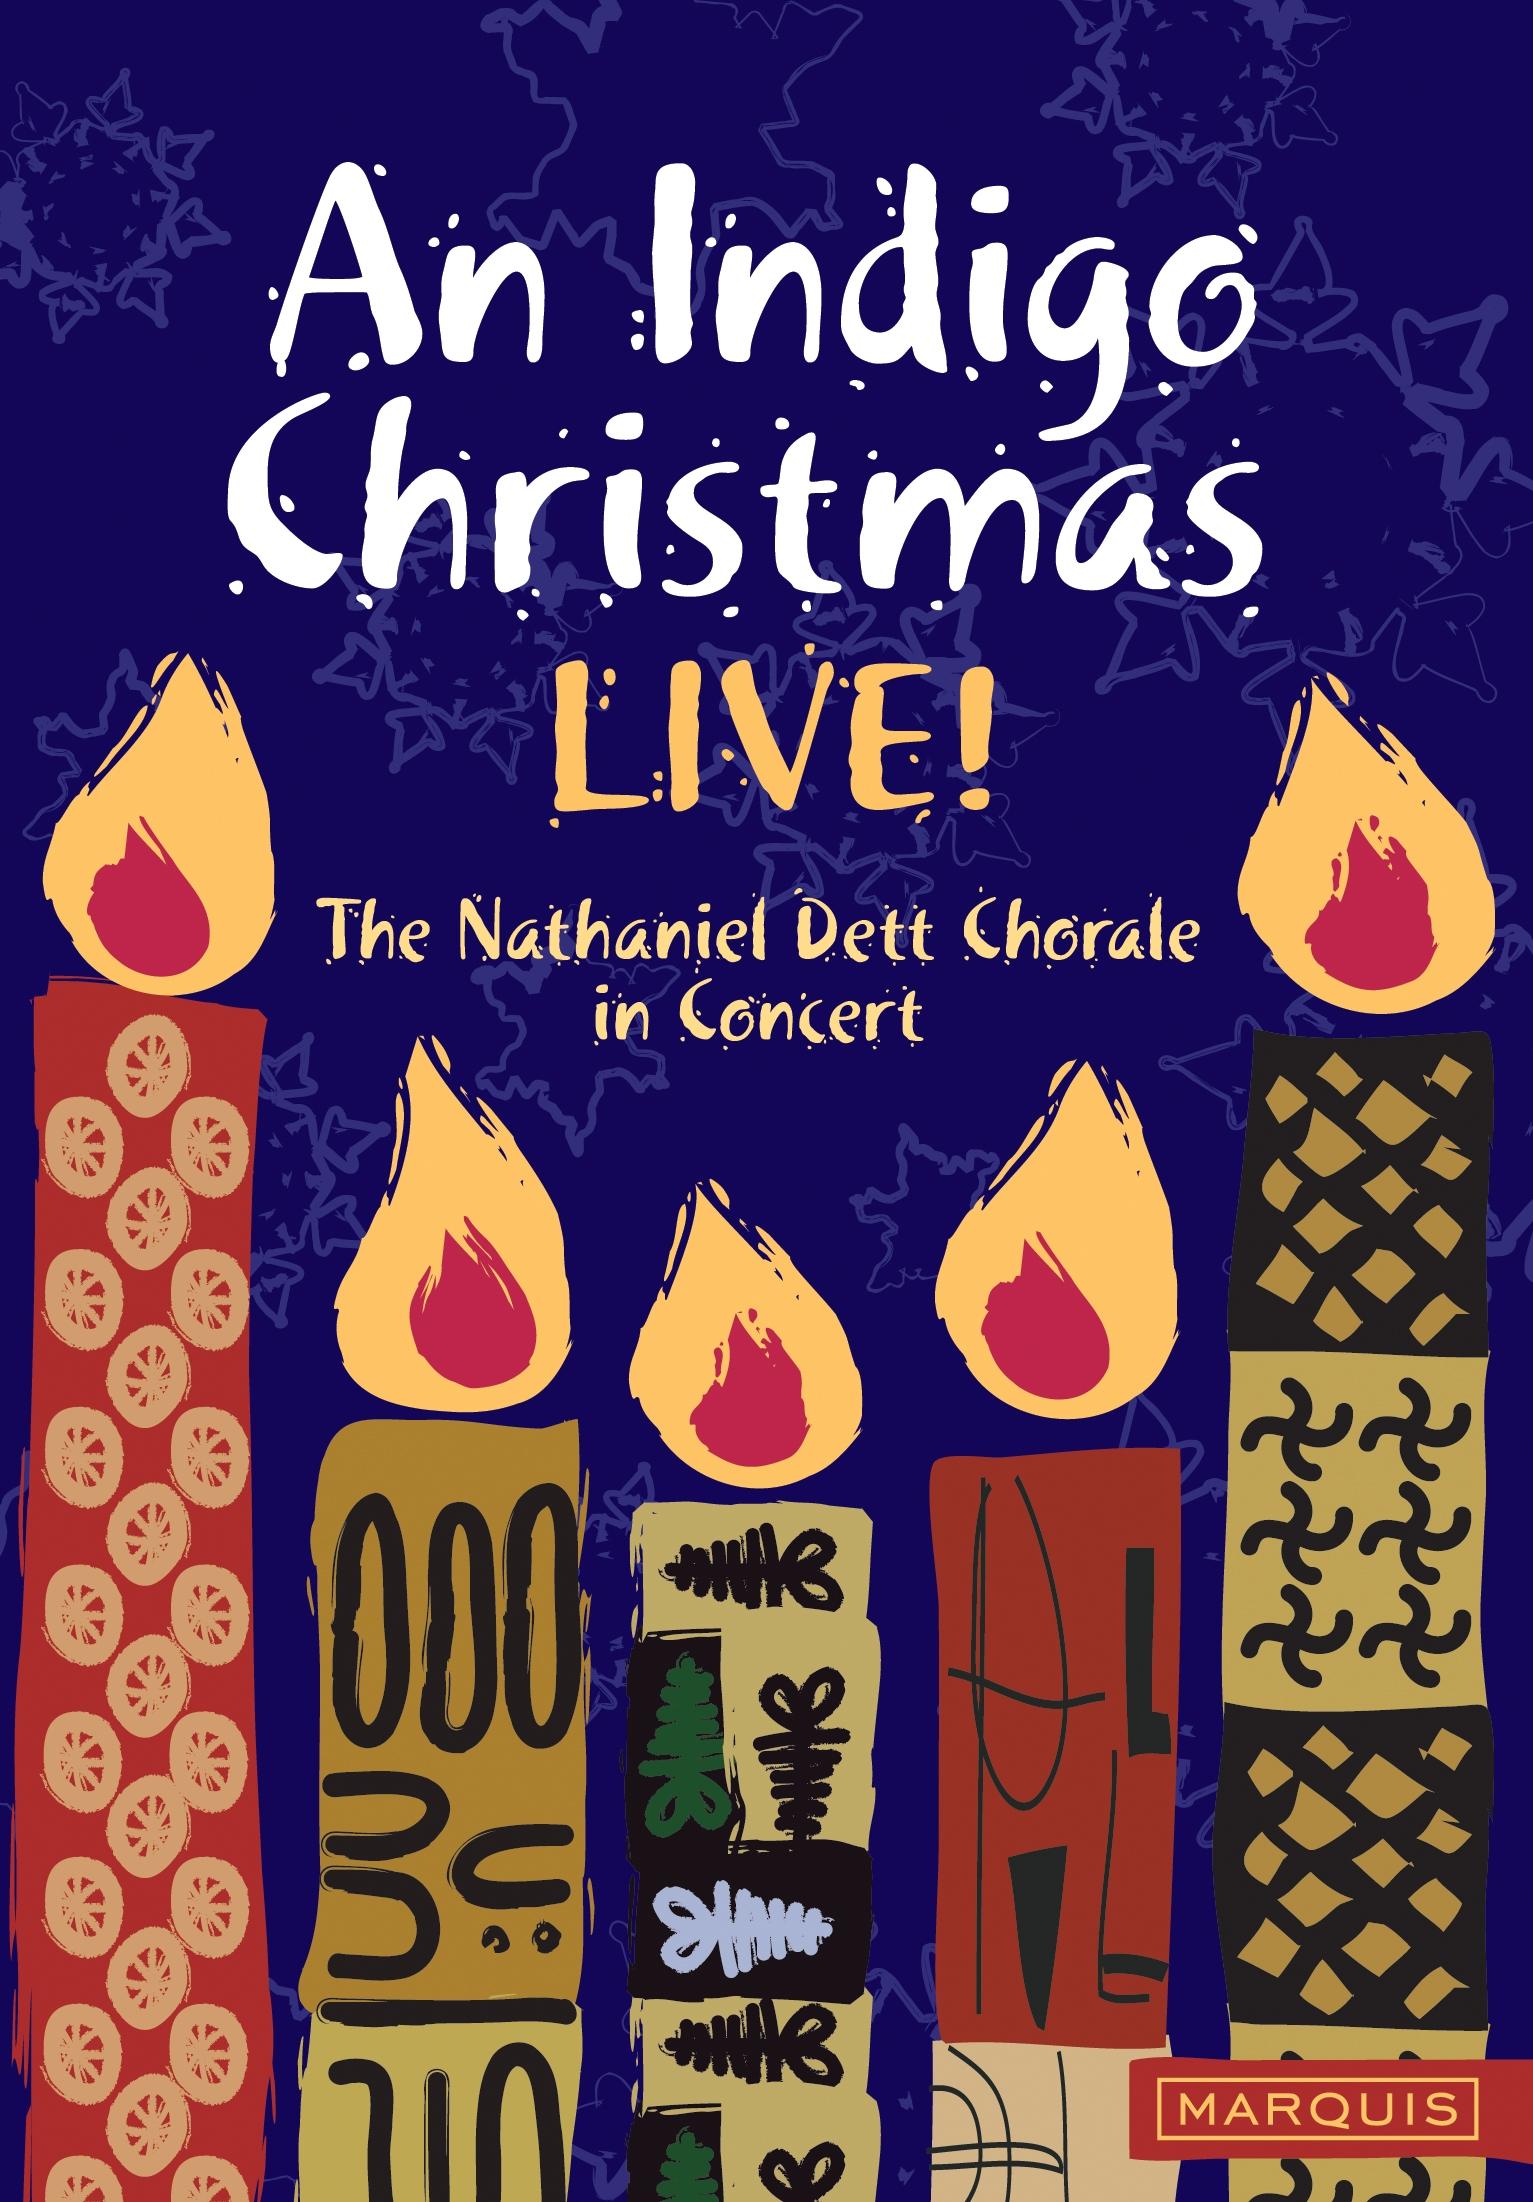 The Nathaniel Dett Chorale: An Indigo Christmas Live